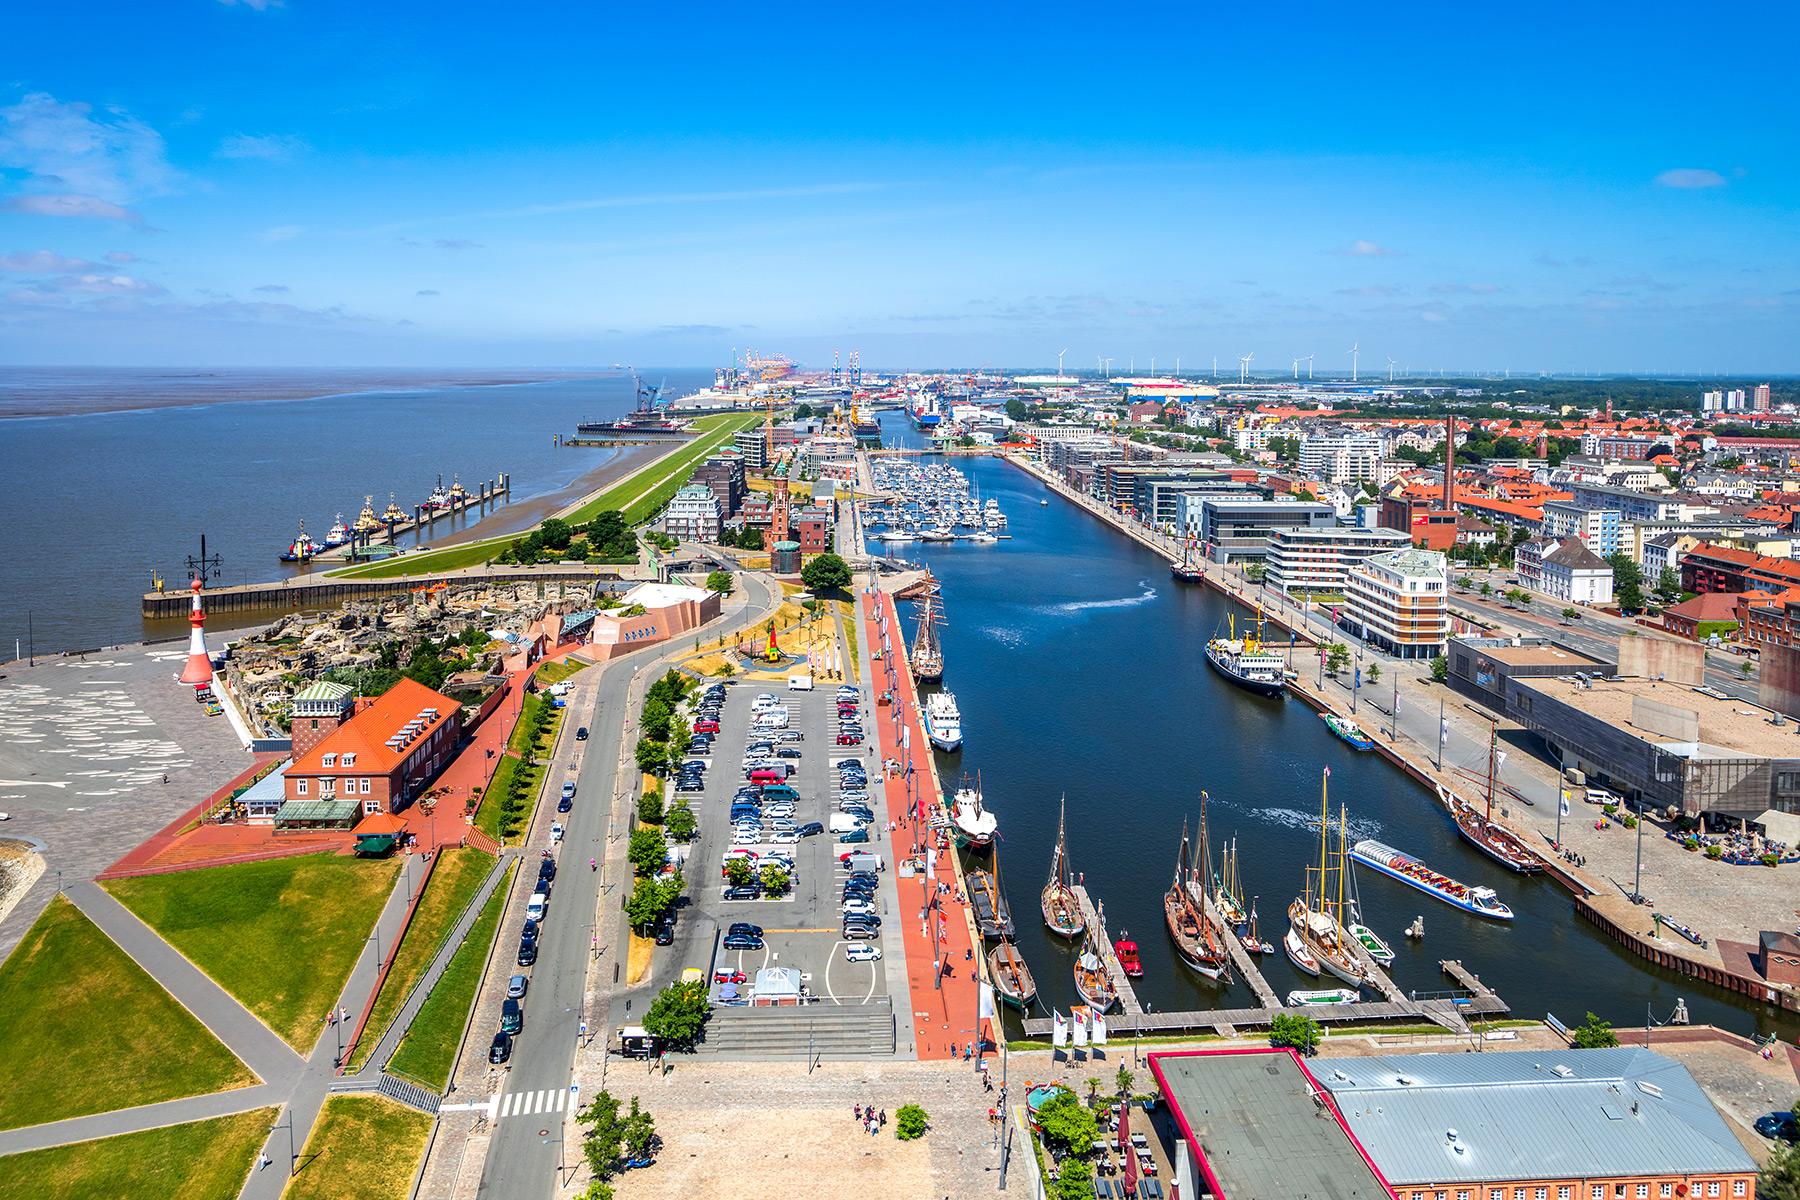 Bremerhaven in Germany